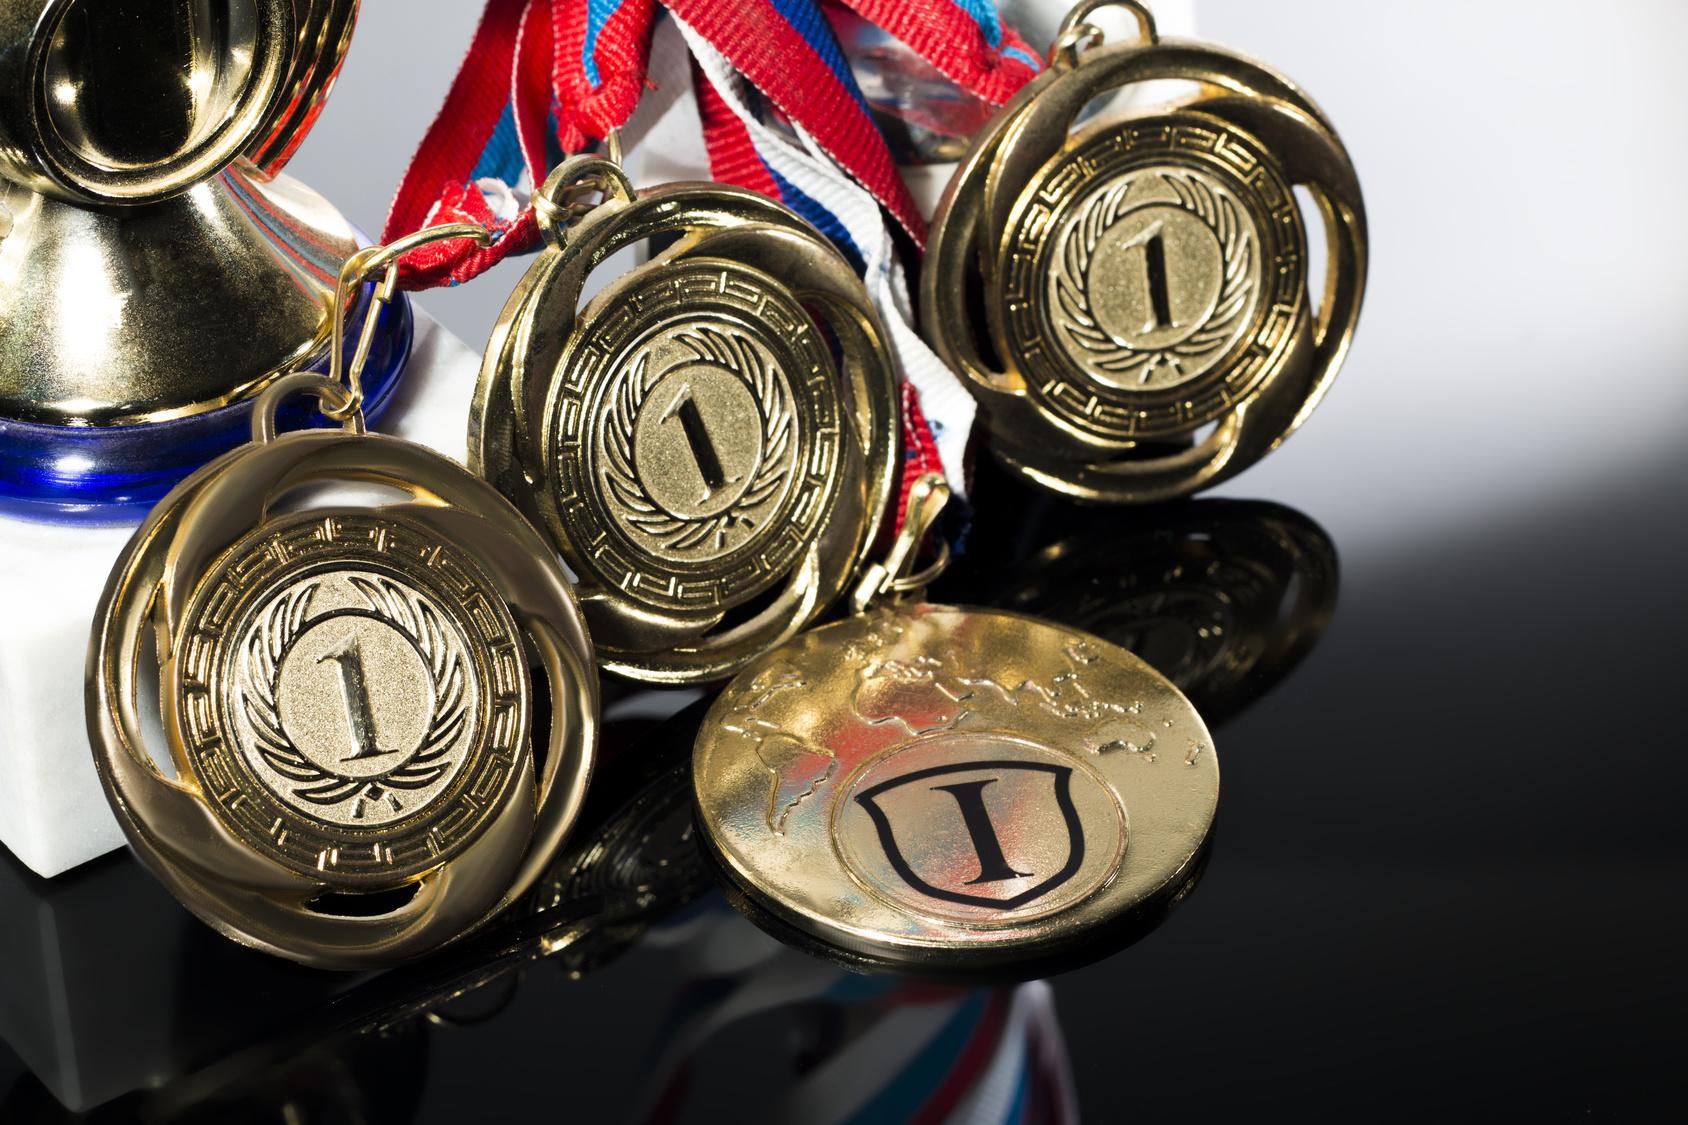 Medale złote